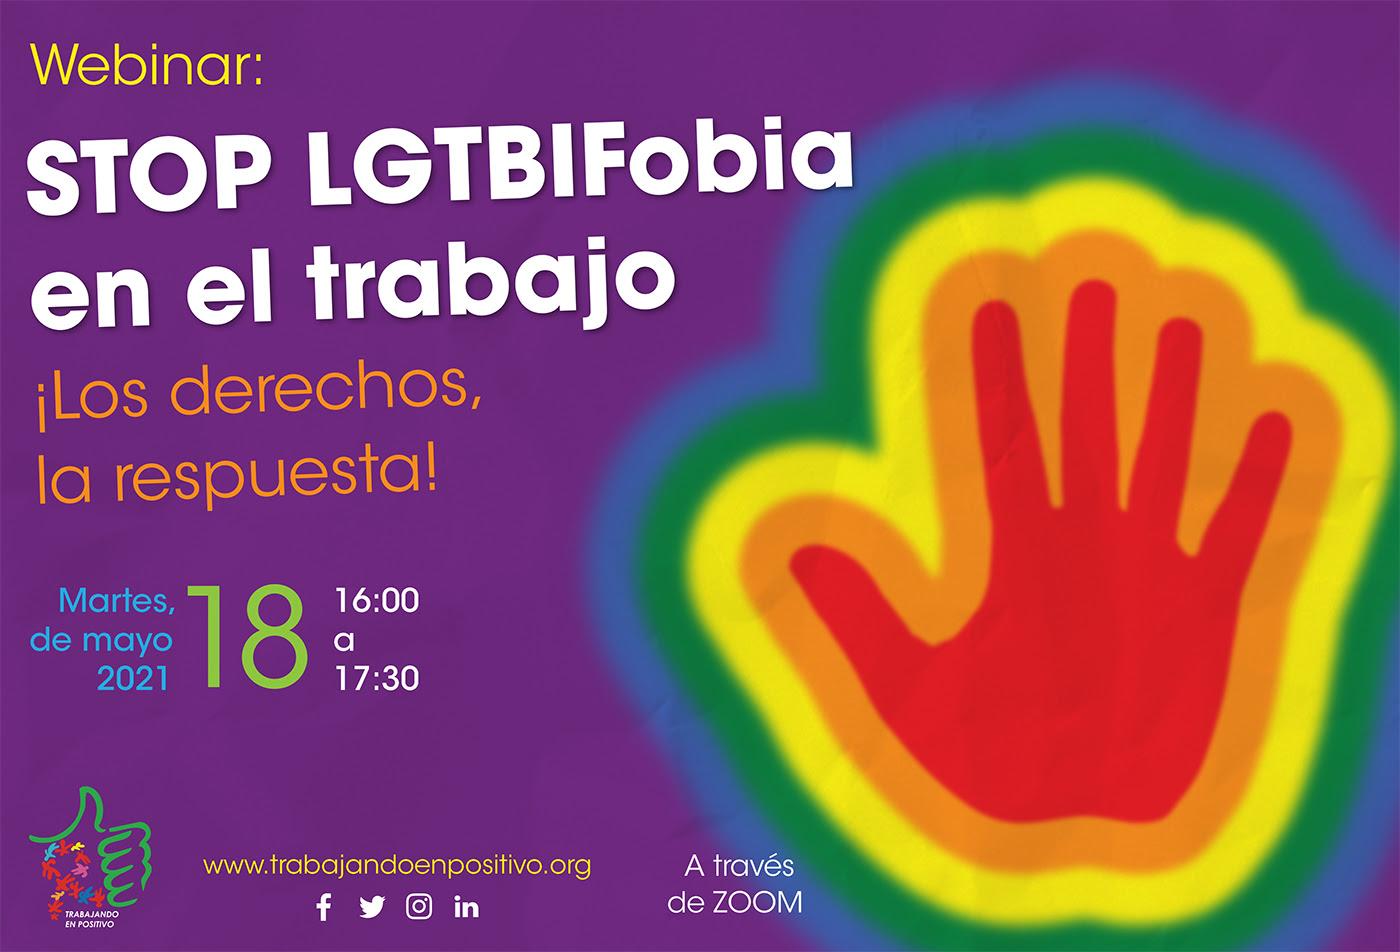 Stop LGTBI fobia